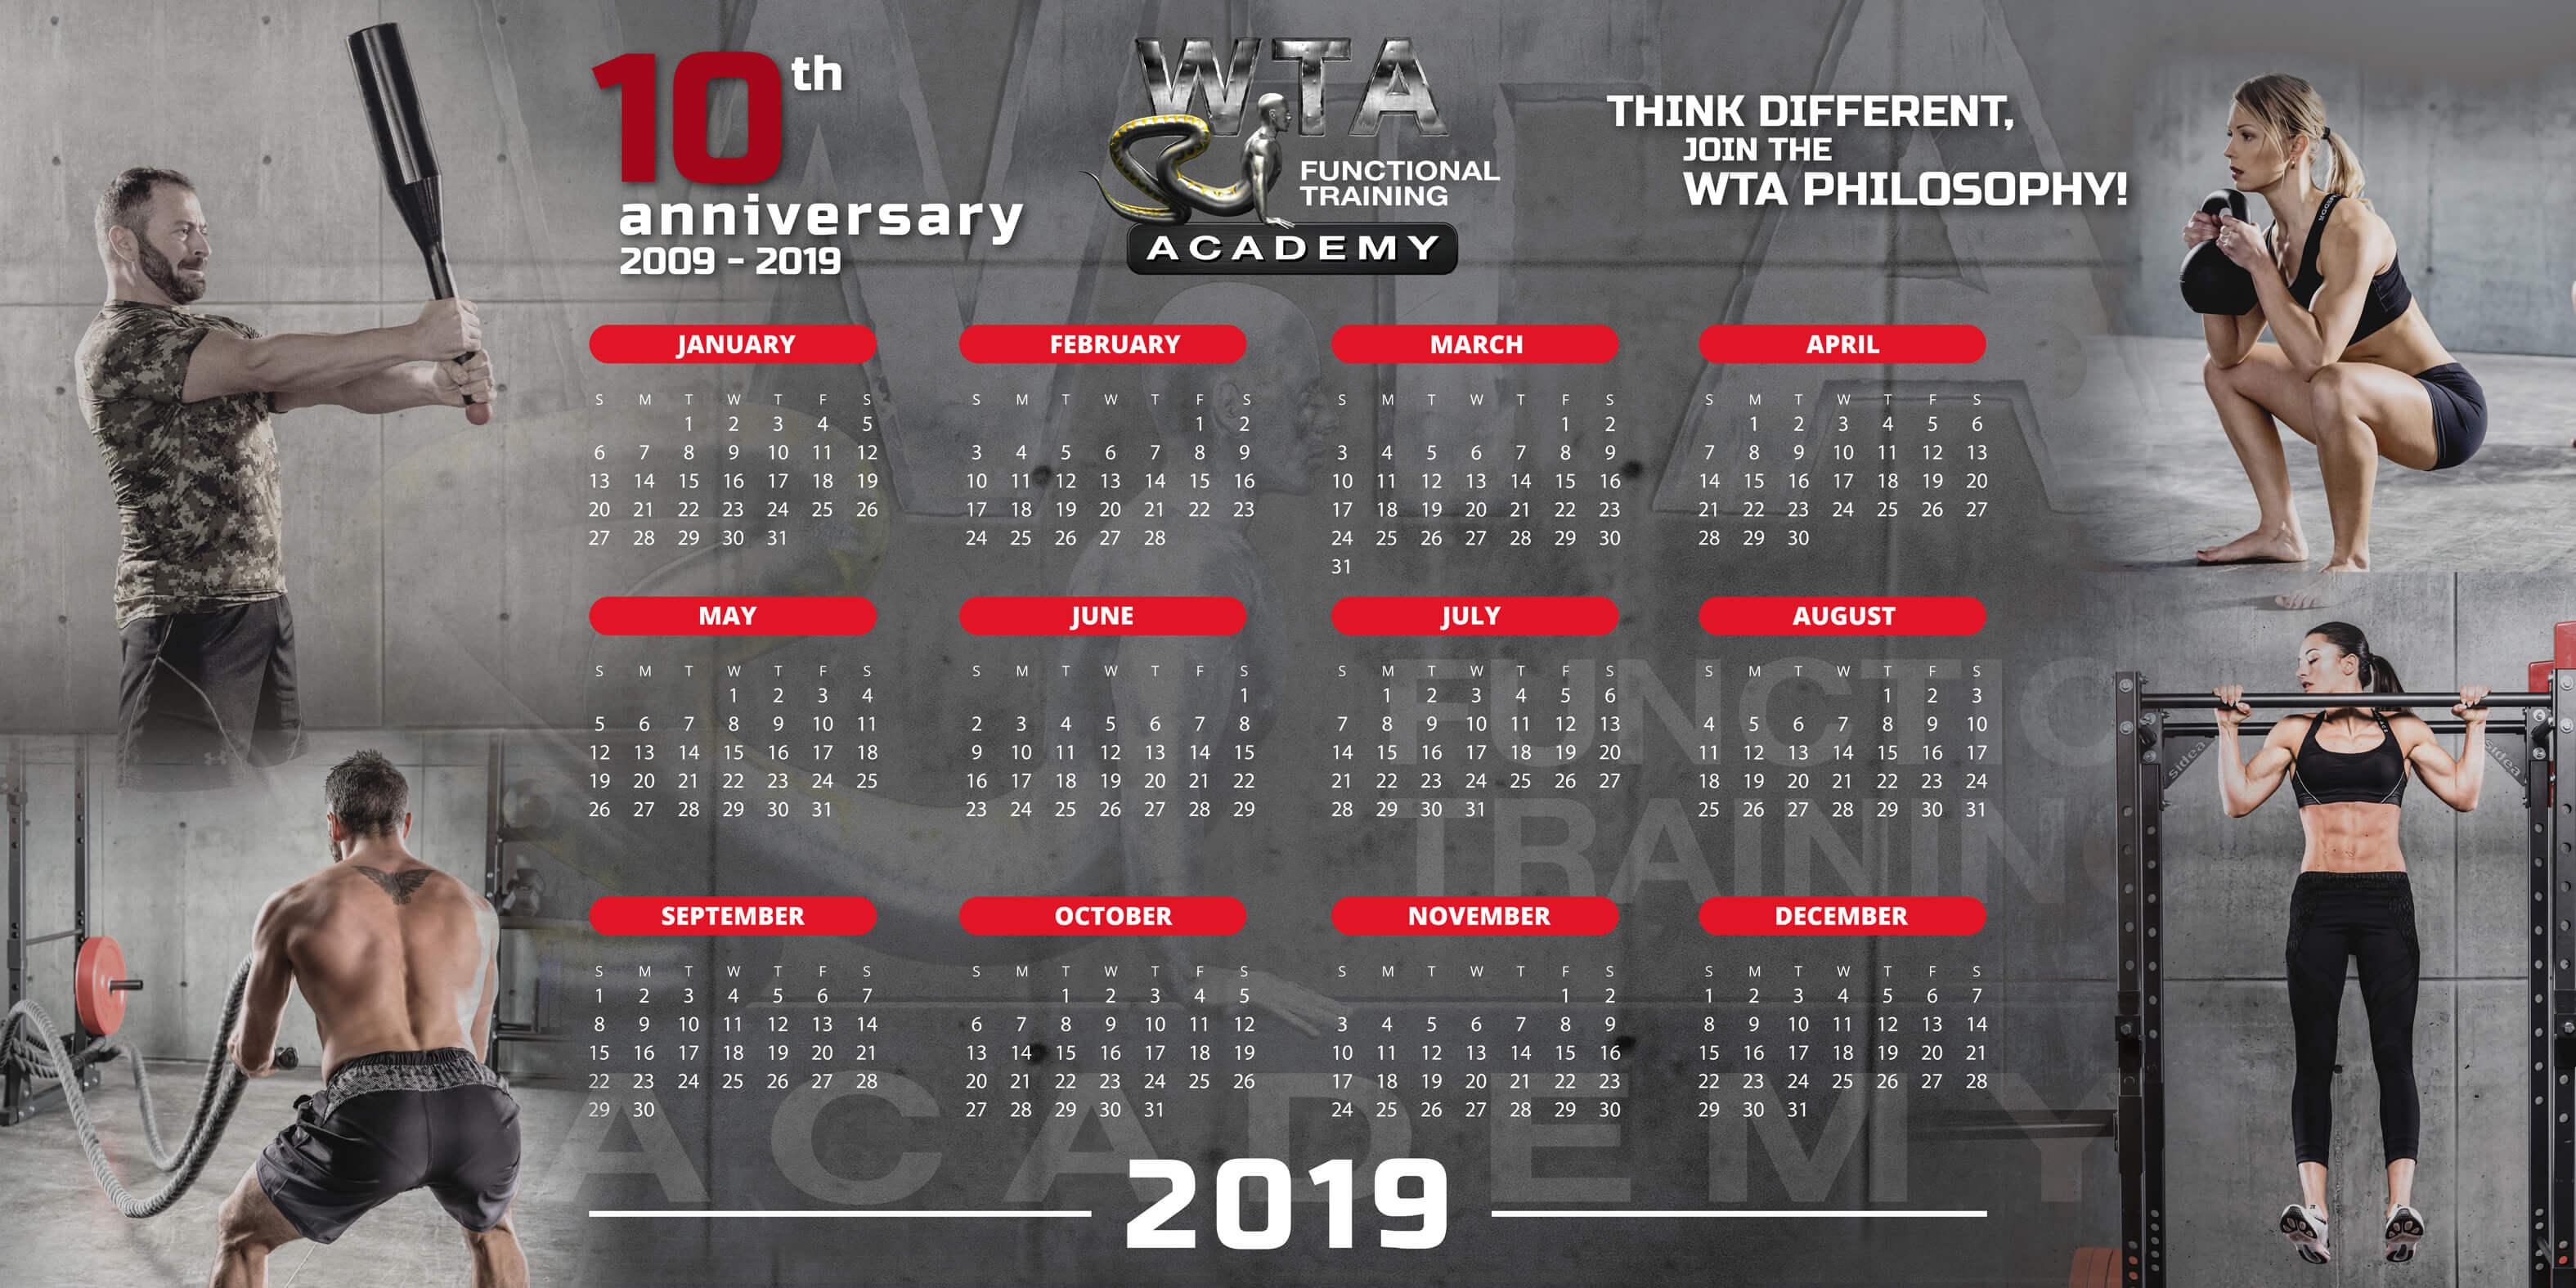 Calendario Wta 2019.News Wta Functional Training